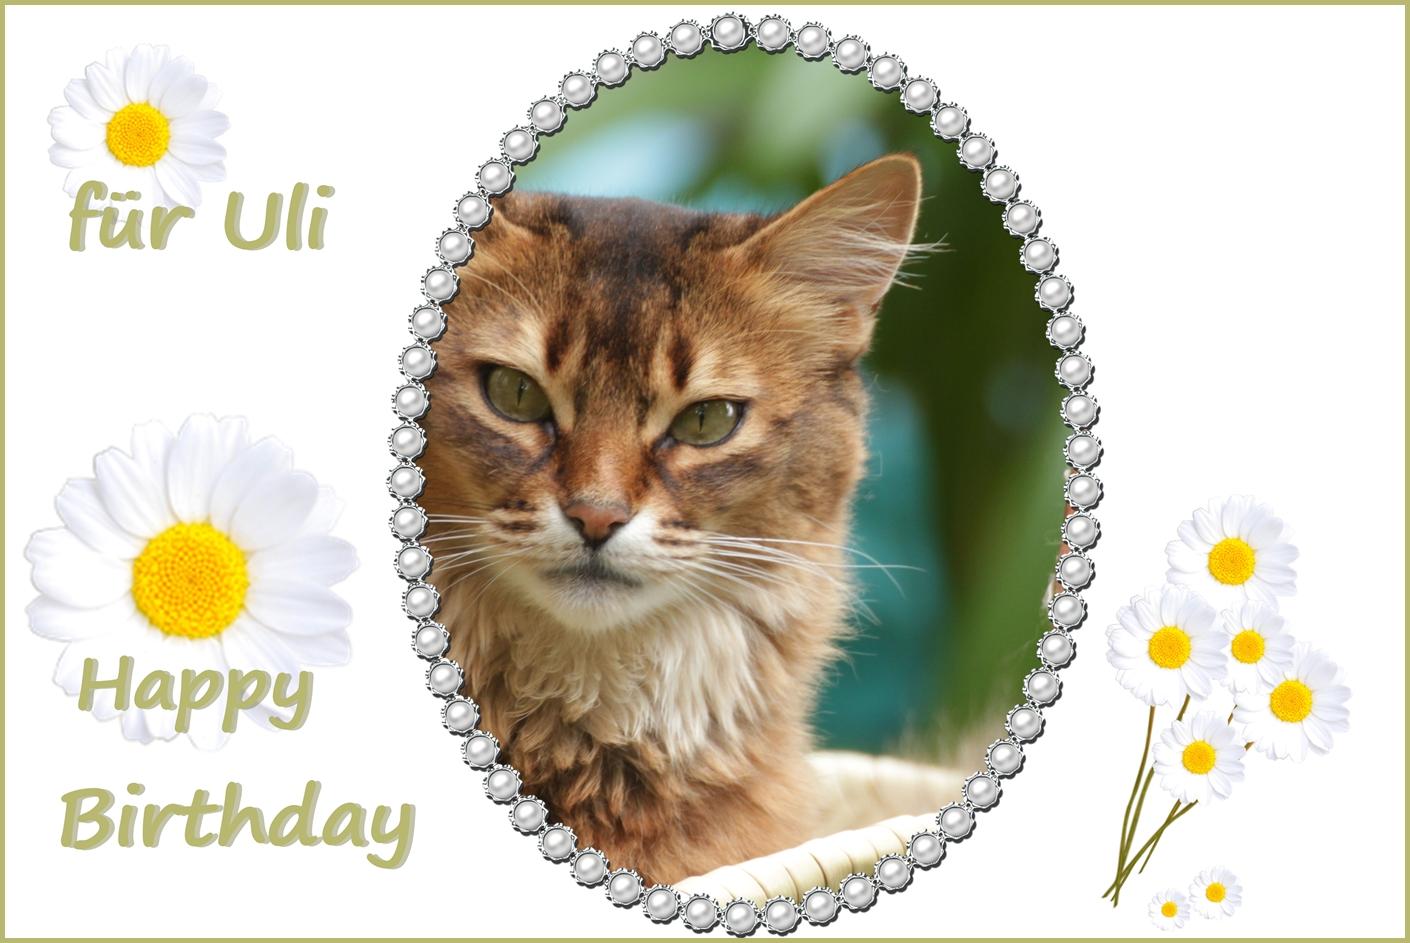 Geburtstagsgrüße Für Uli Foto Bild Spezial Katze Geburtstag